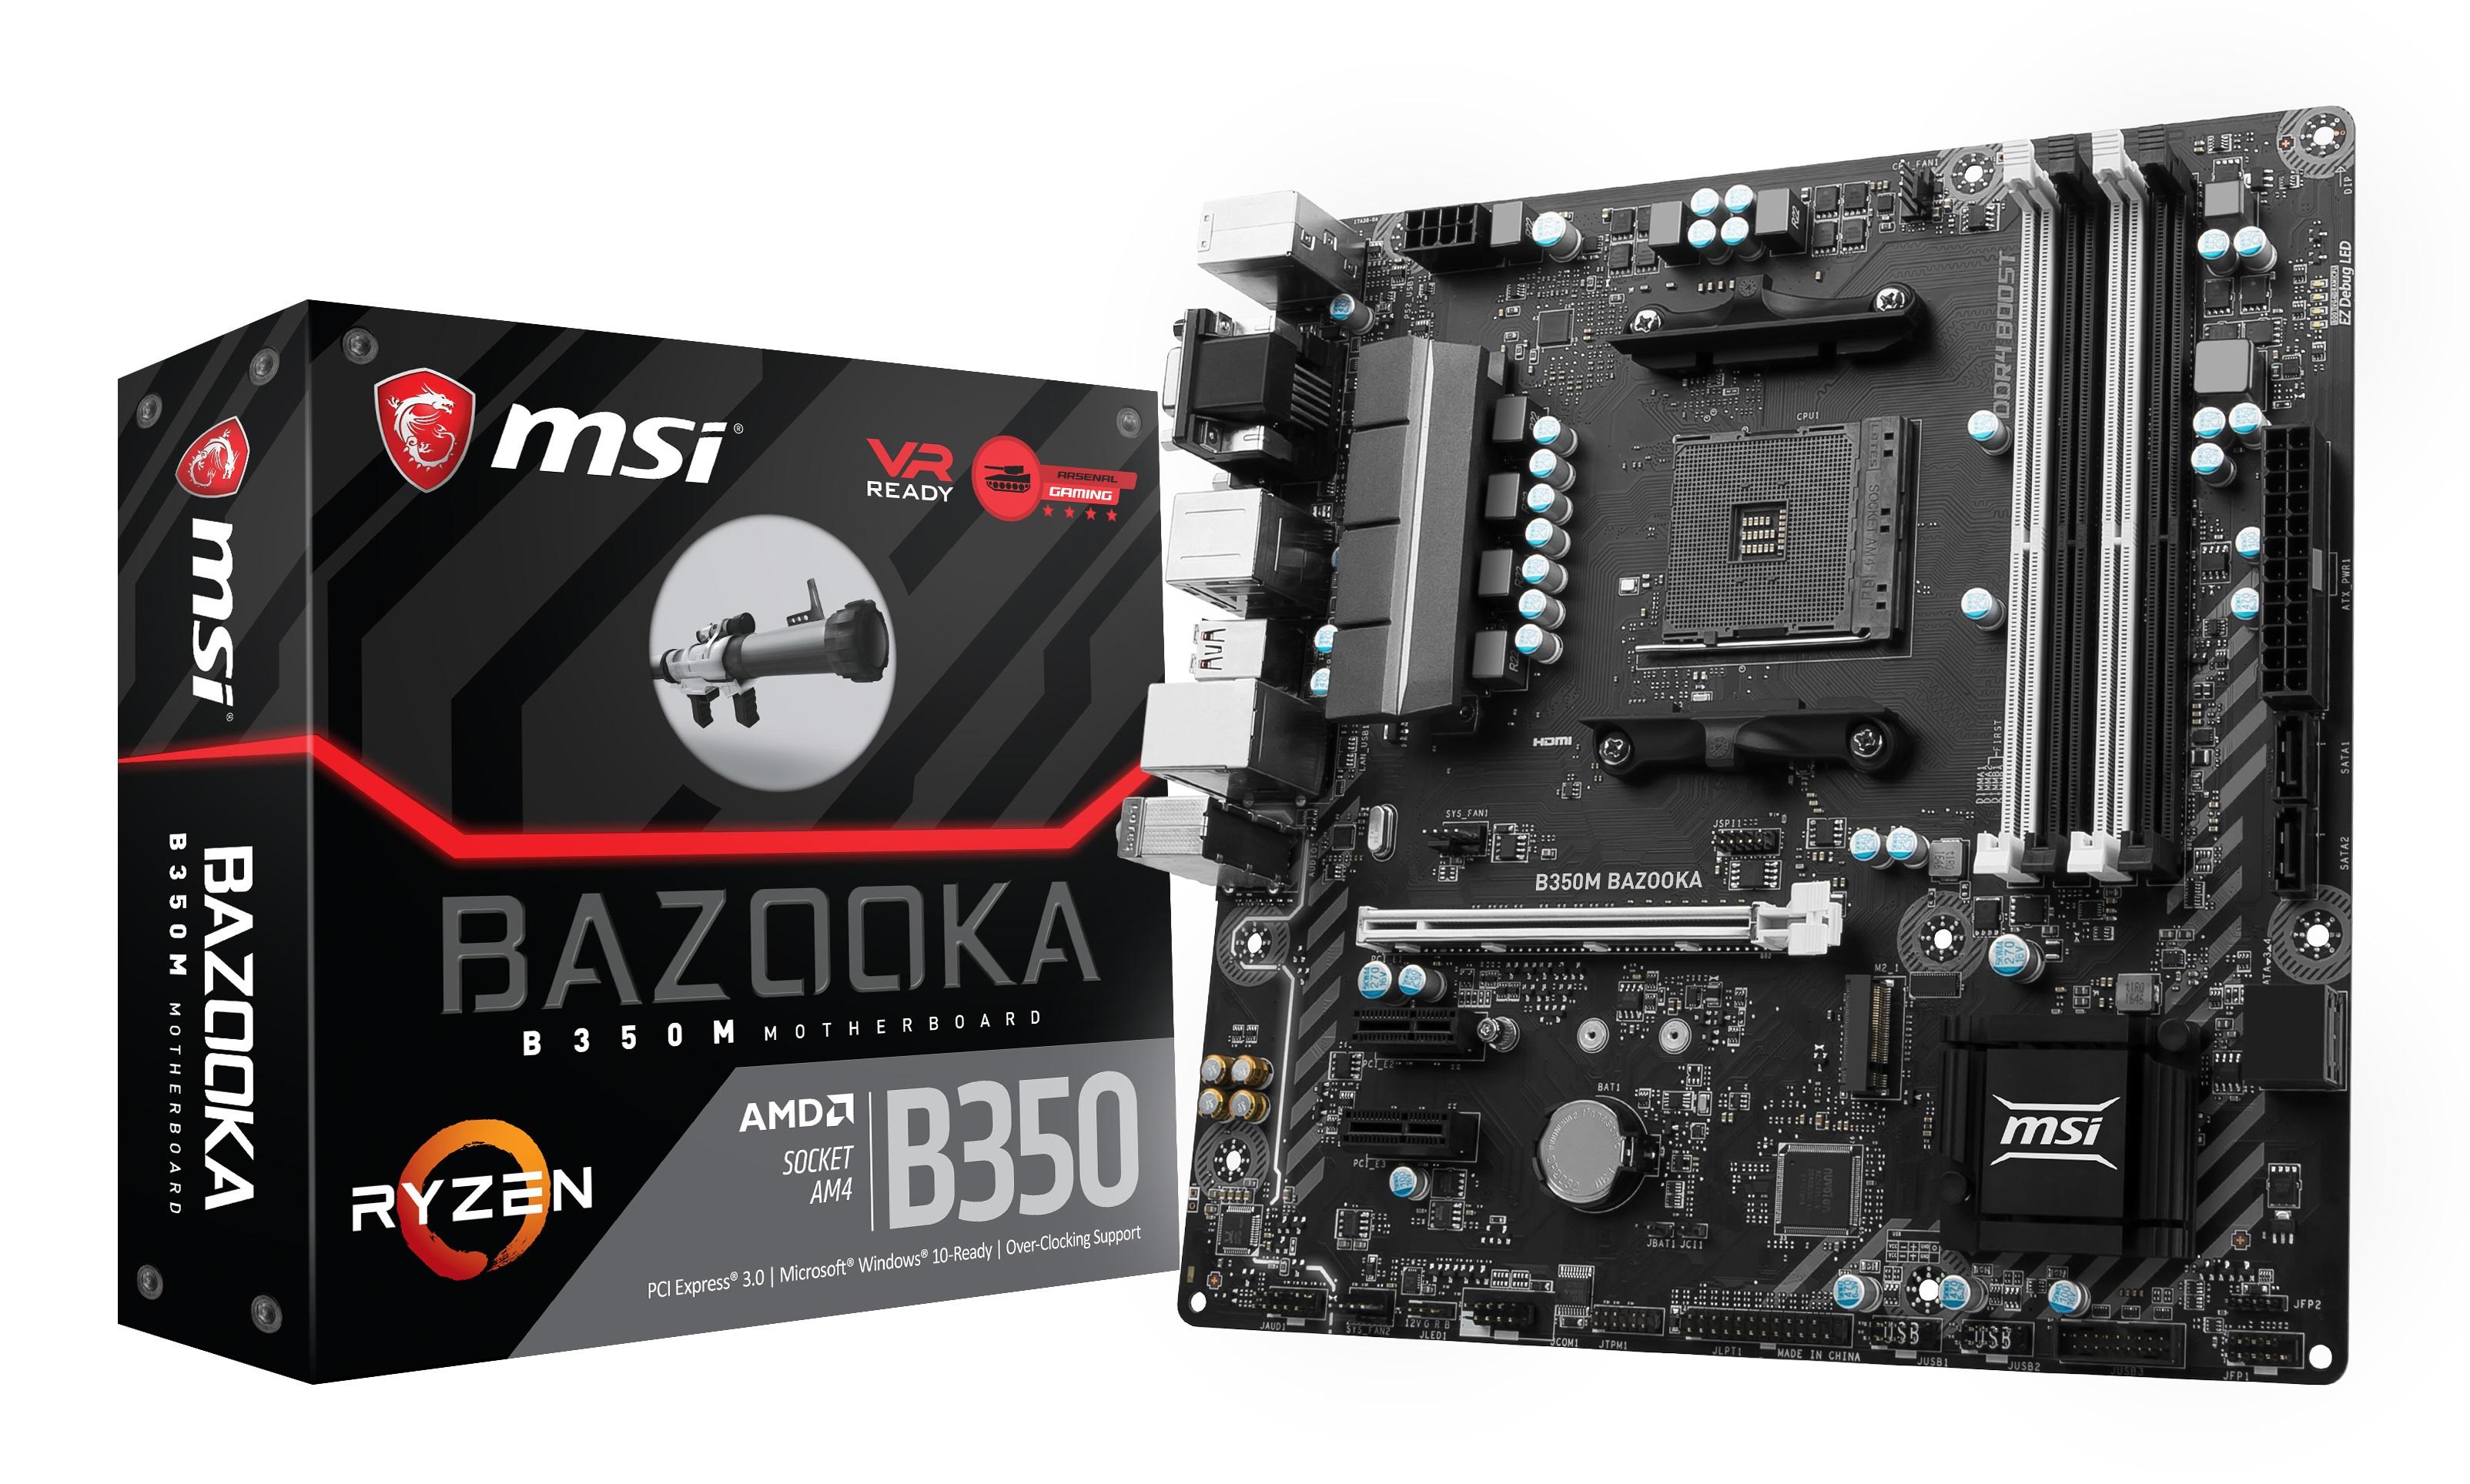 MSI B350M BAZOOKA AMD B350 Socket AM4 Micro ATX scheda madre 4719072512309 B350M BAZOOKA 03_B350M BAZOOKA